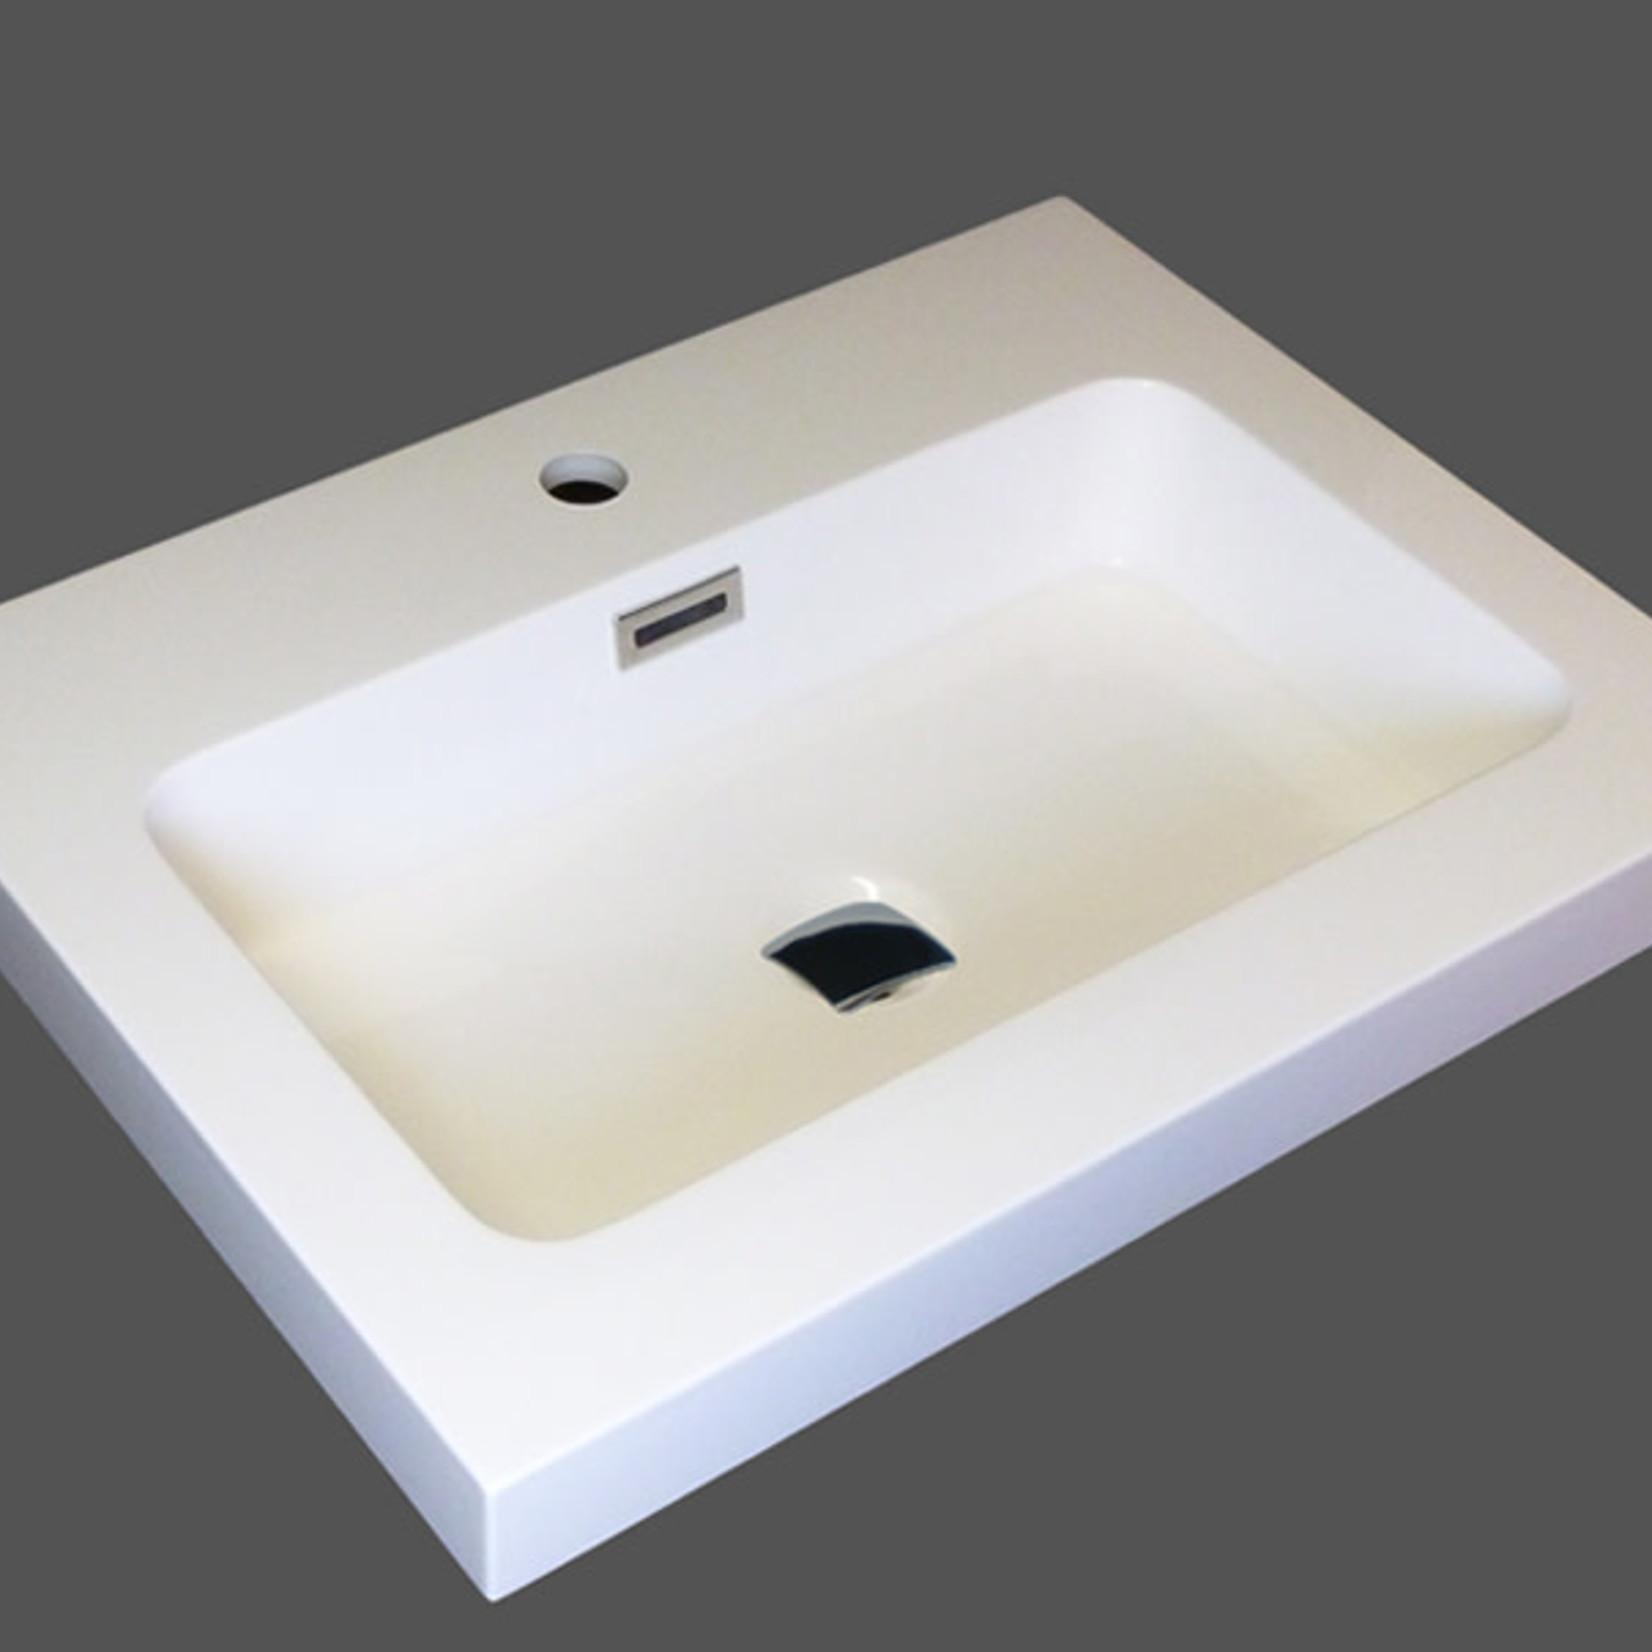 "Lavabo salle de bain composite 24""LR 605-Cotton Bellati"